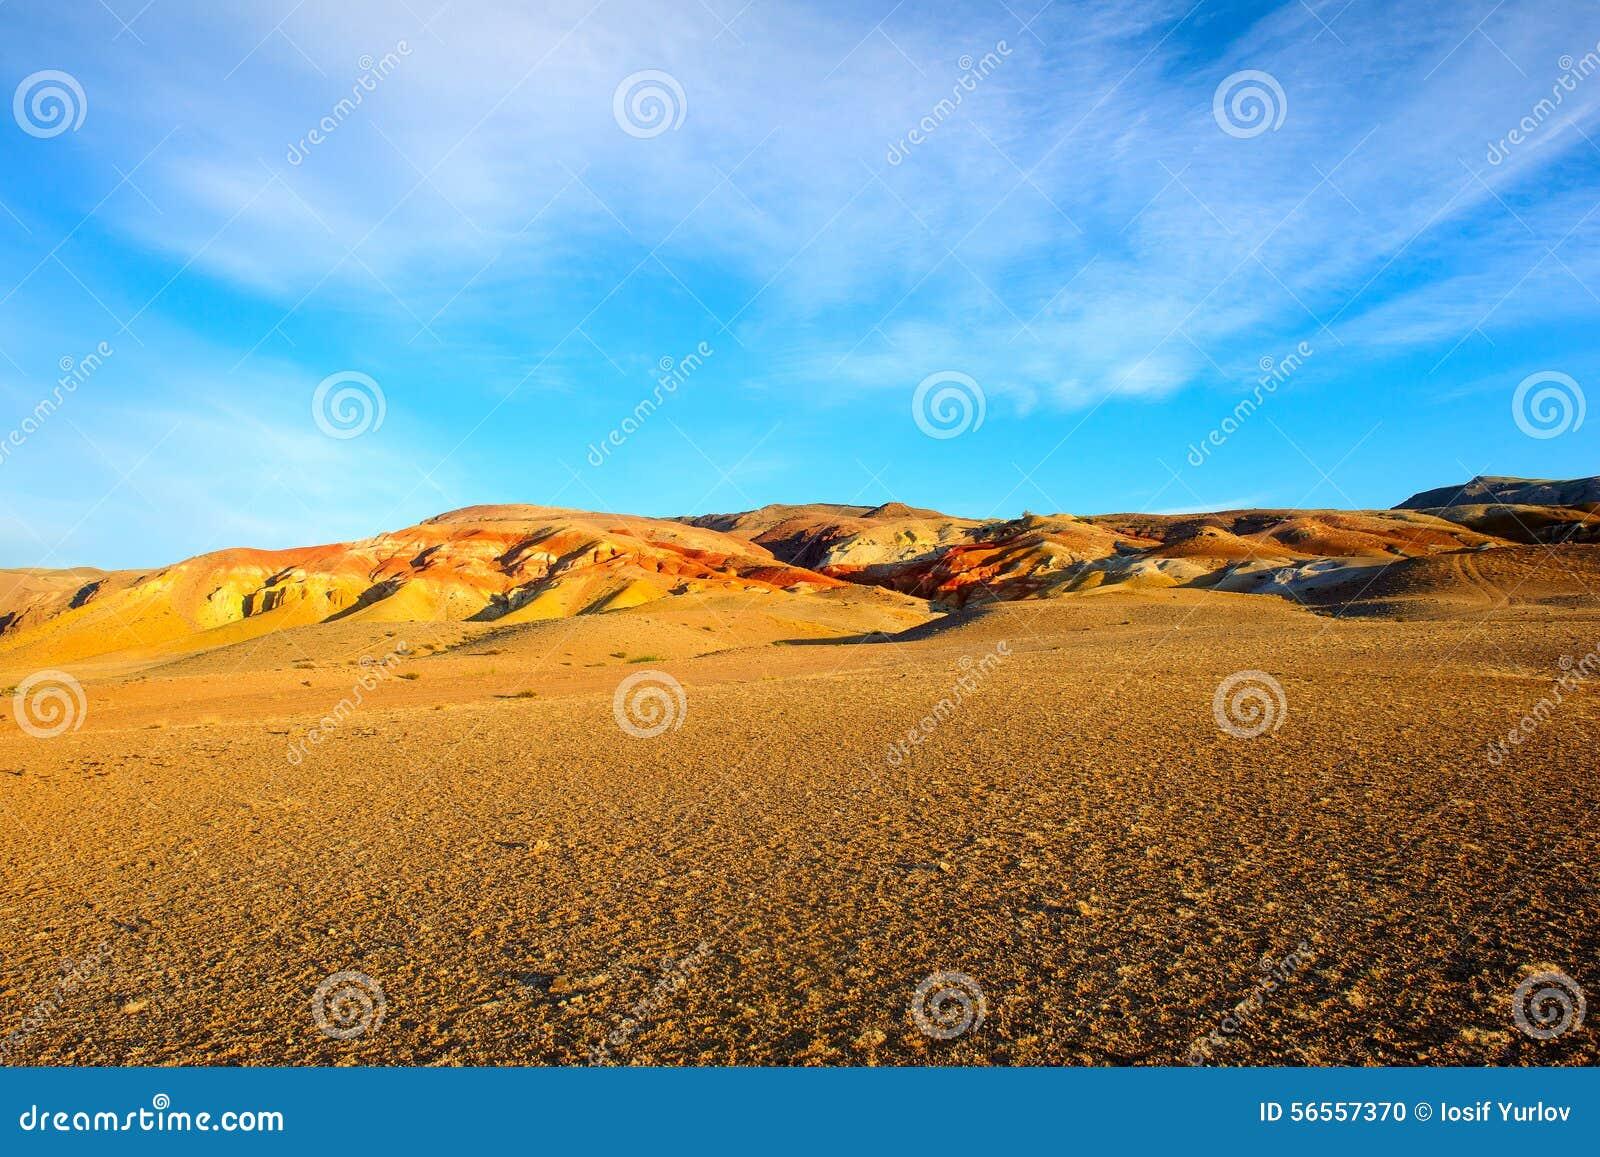 Download Χώμα χρώματος των καταθέσεων υδραργύρου σε Altai Στοκ Εικόνες - εικόνα από τοπίο, υδράργυρος: 56557370